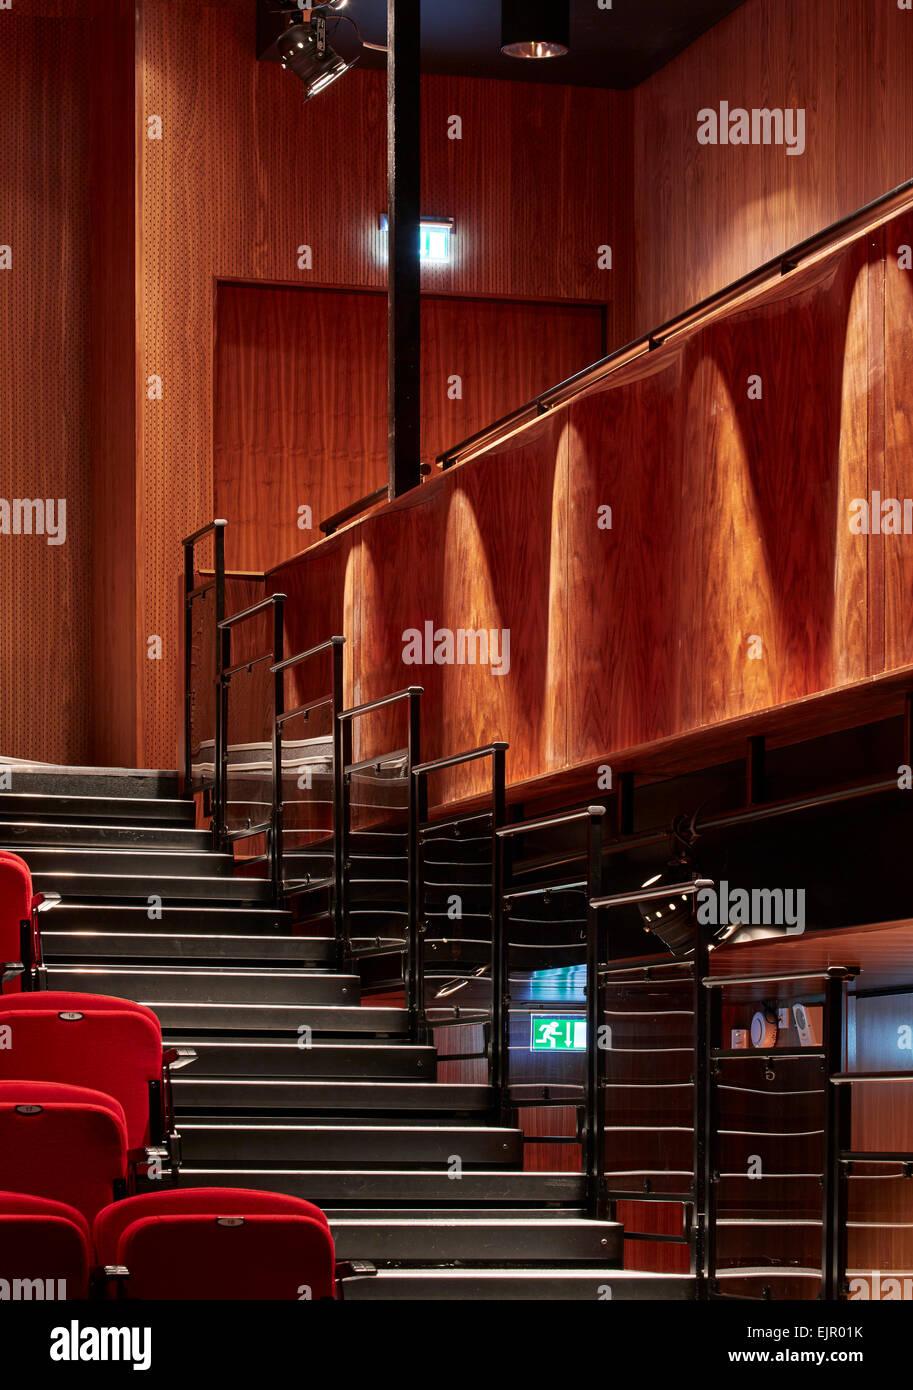 Detailed view retractable bleachers and acoustic walnut baffle. Lady Eleanor Holles School, Hampton, United Kingdom. - Stock Image